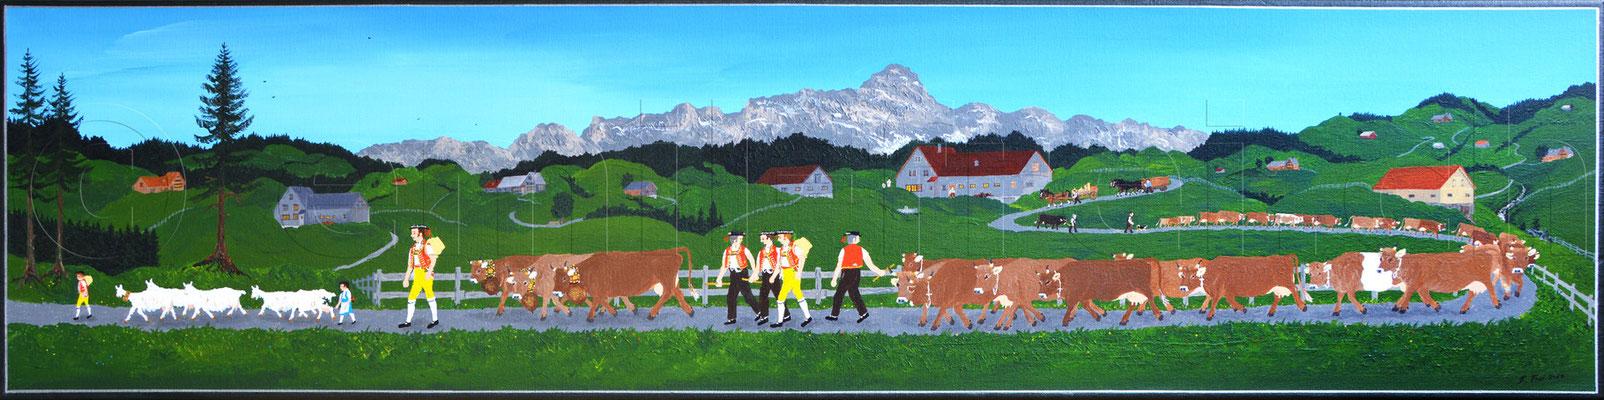 30 x 120 cm, Acryl auf Leinwand, 2014